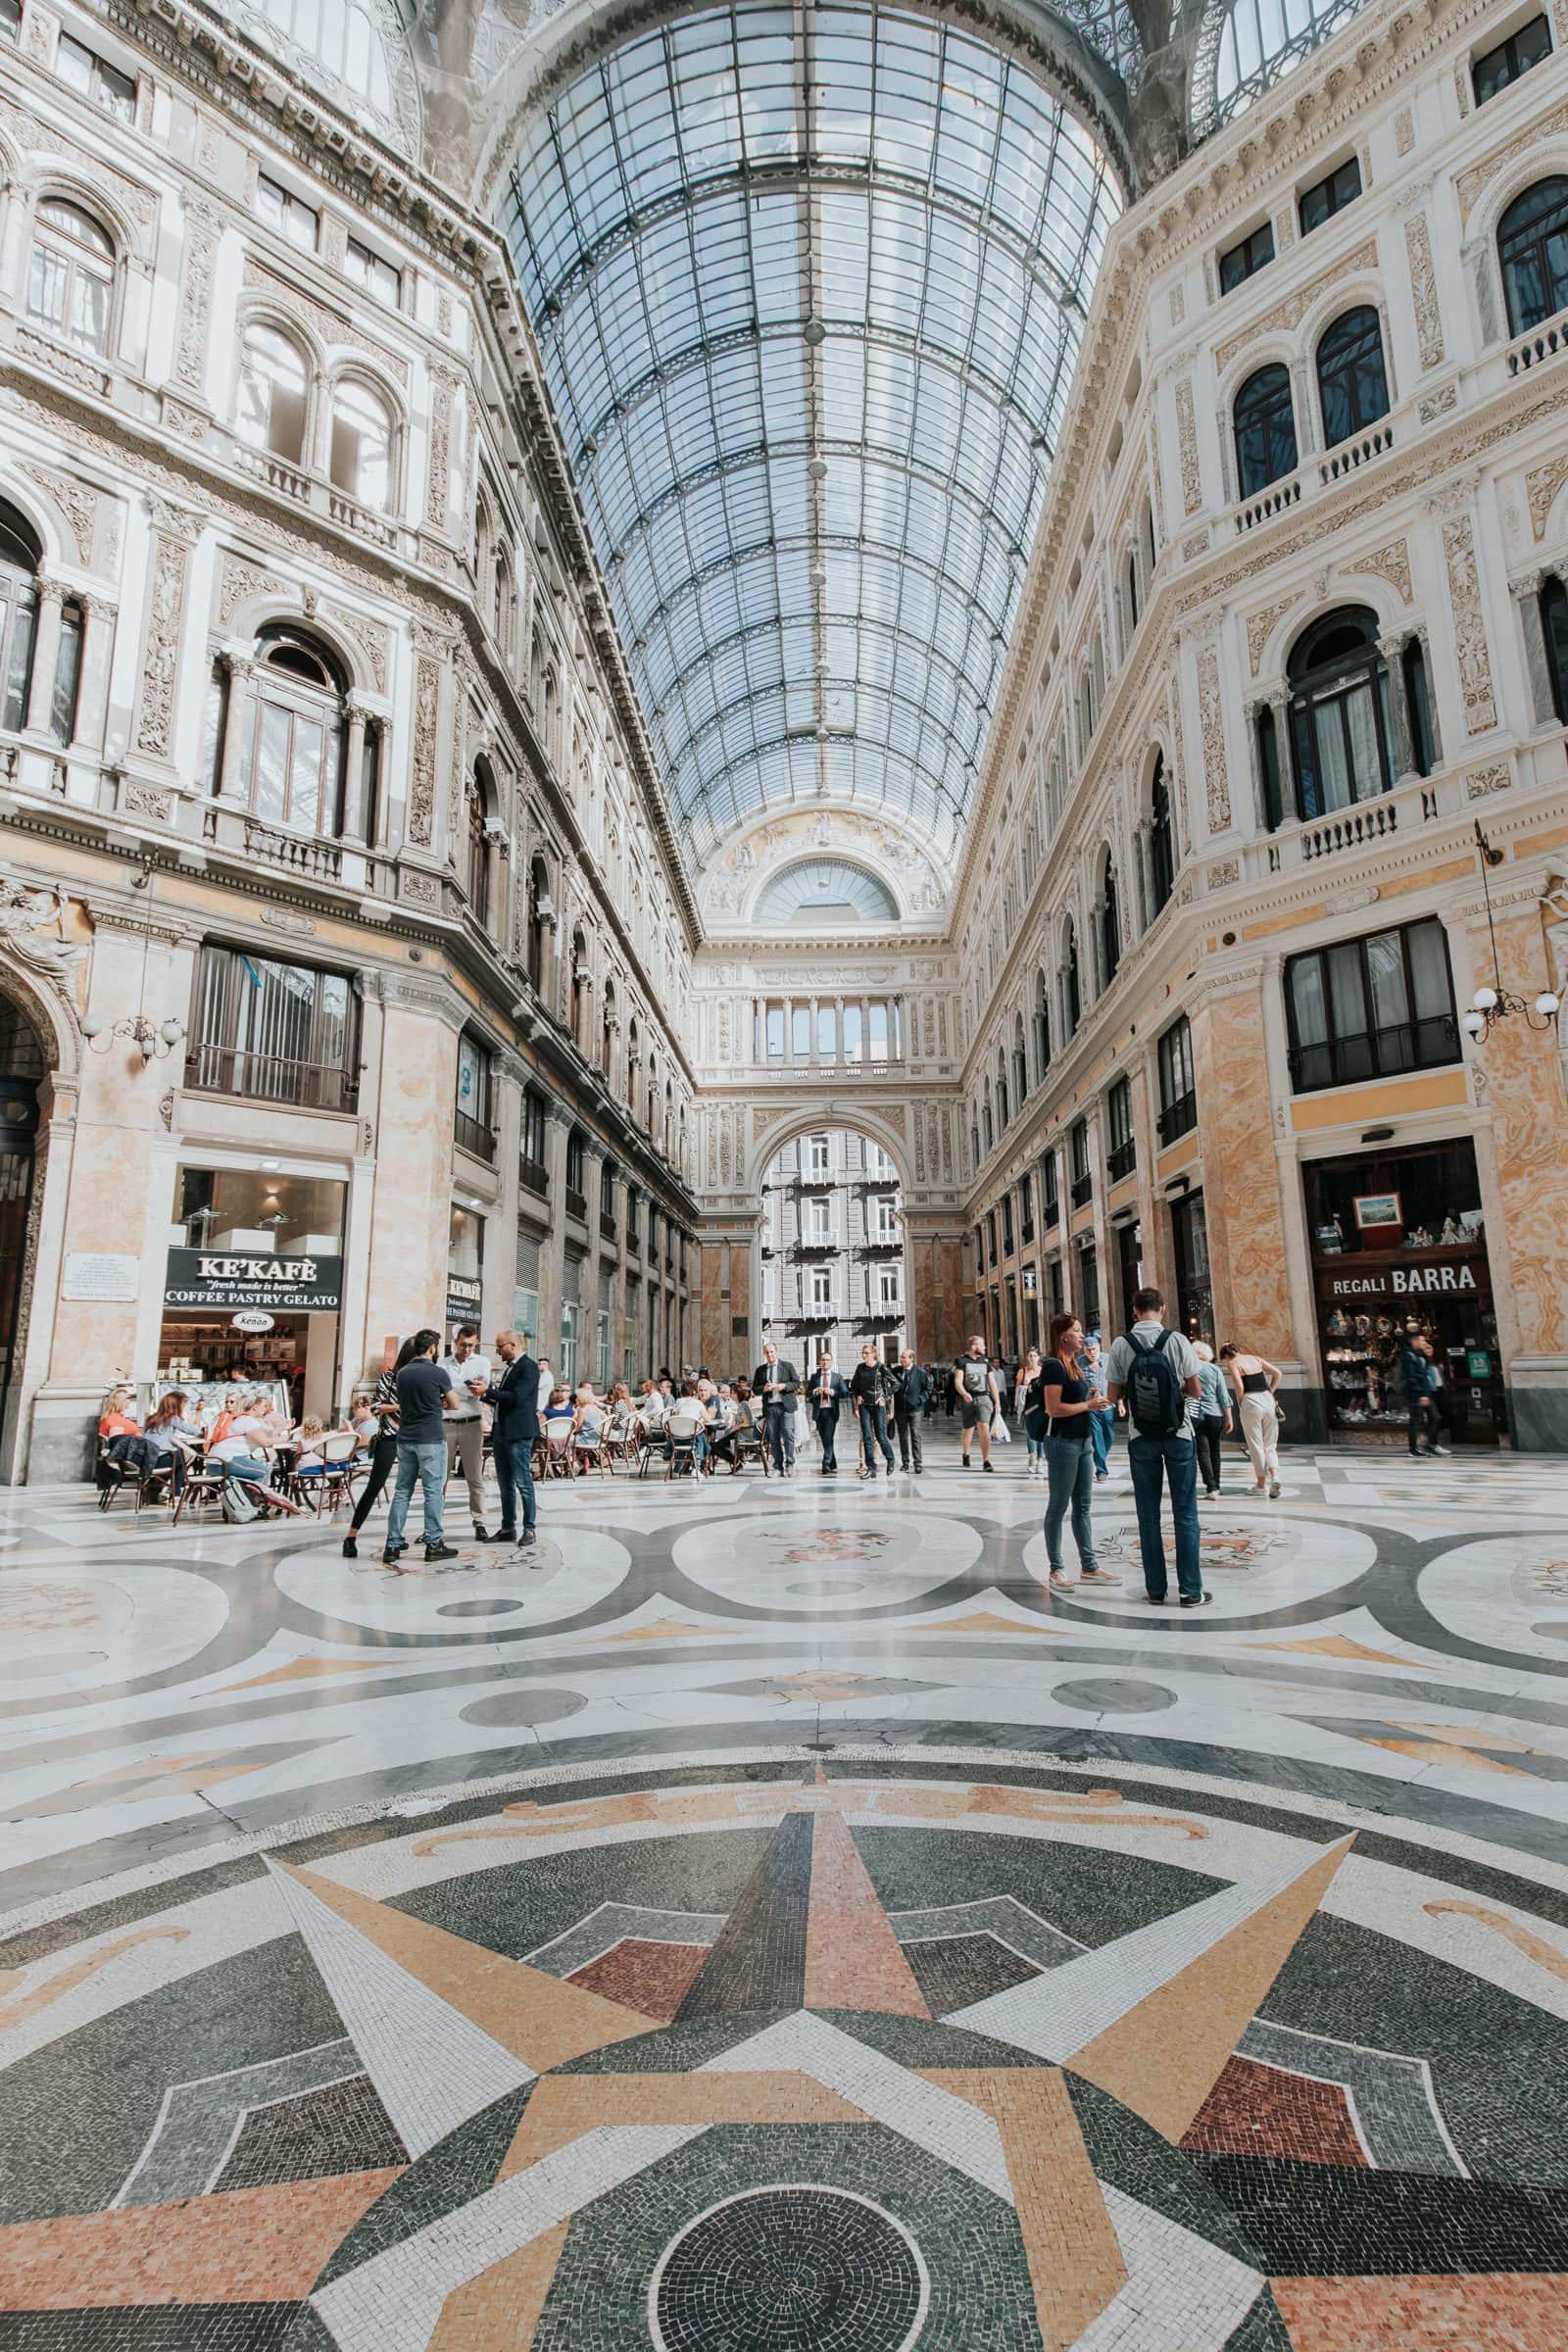 Neapel Sehenswürdigkeiten Galleria Umberto I